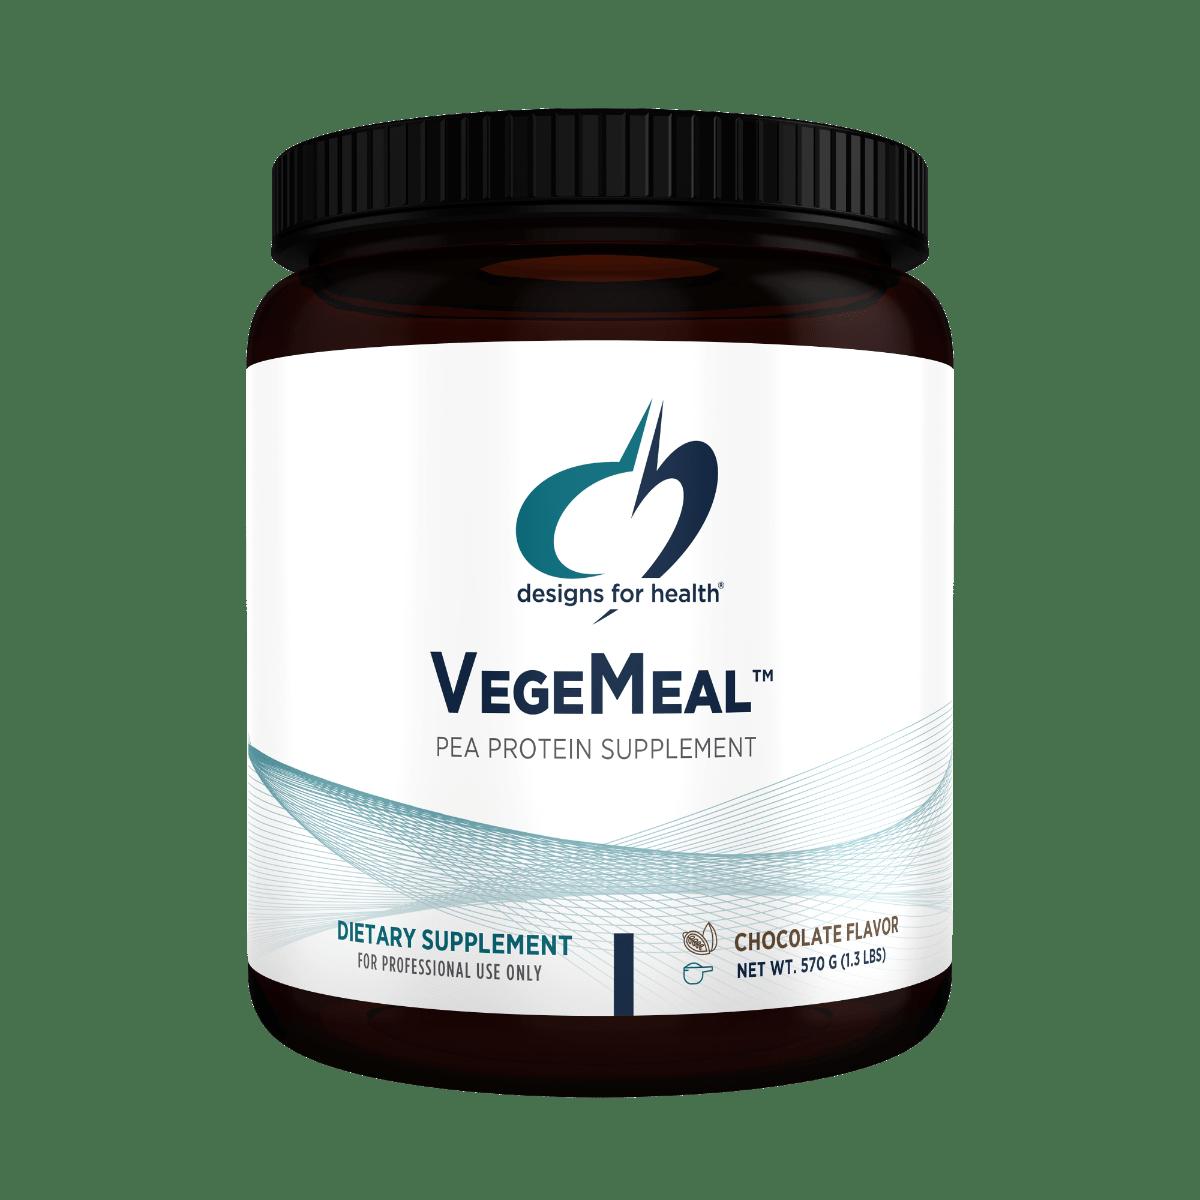 VegeMeal Chocolate 570 g (1.3 lbs) Designs for Health